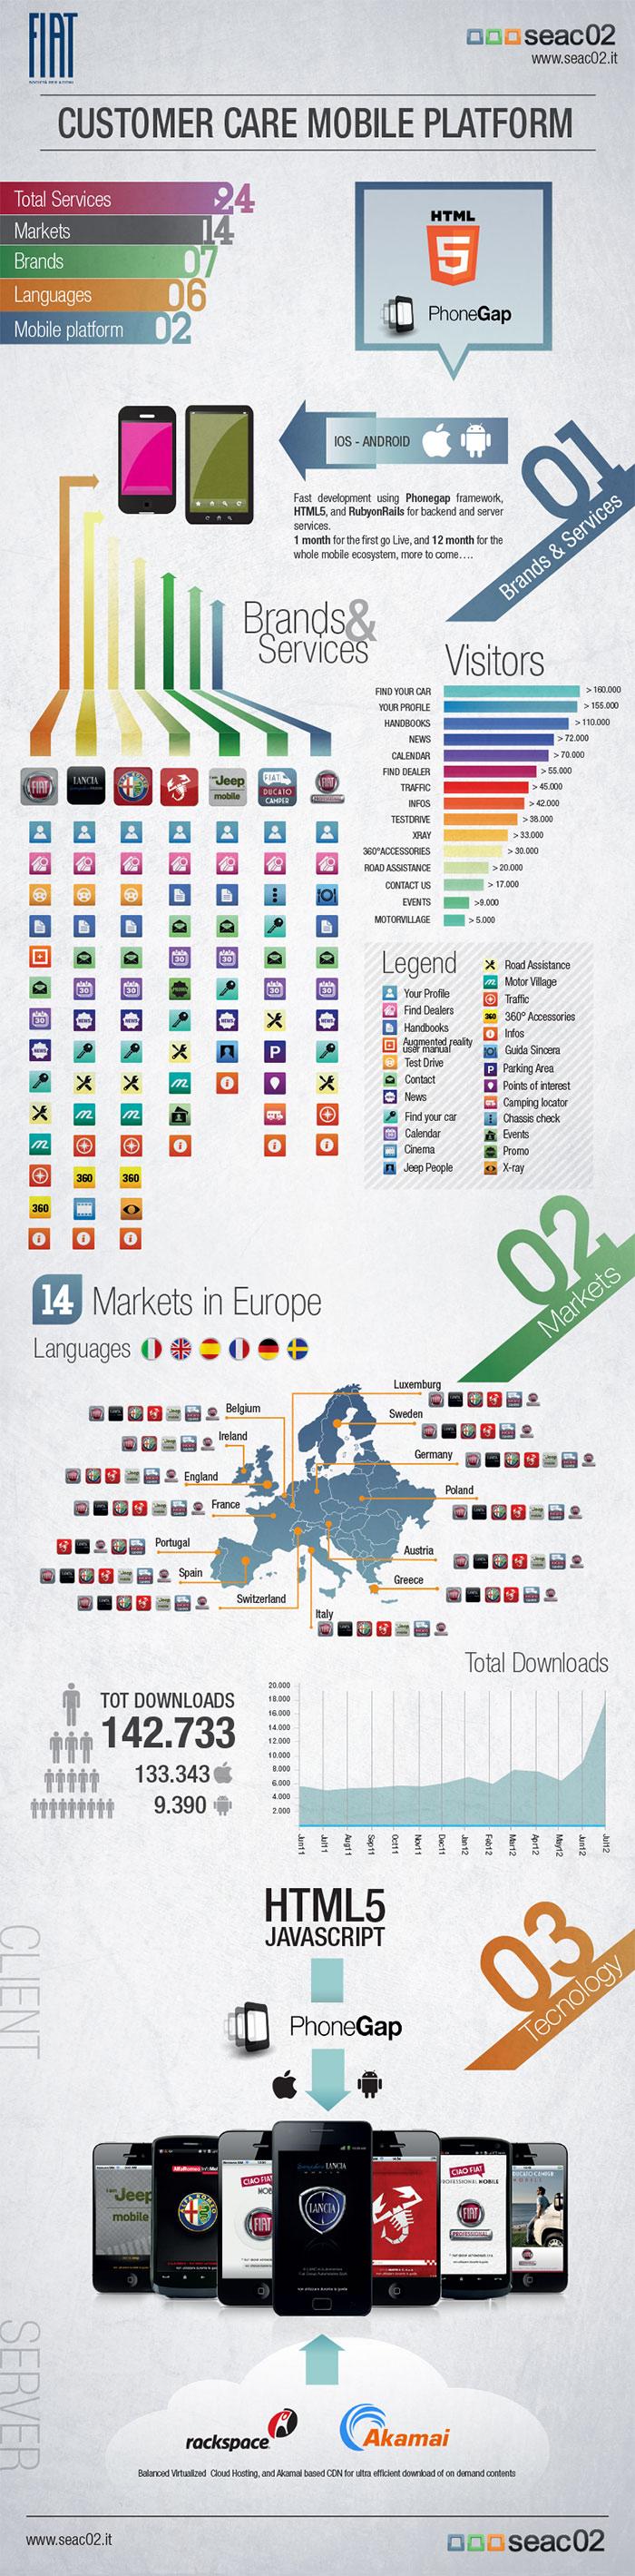 infografica_fiat